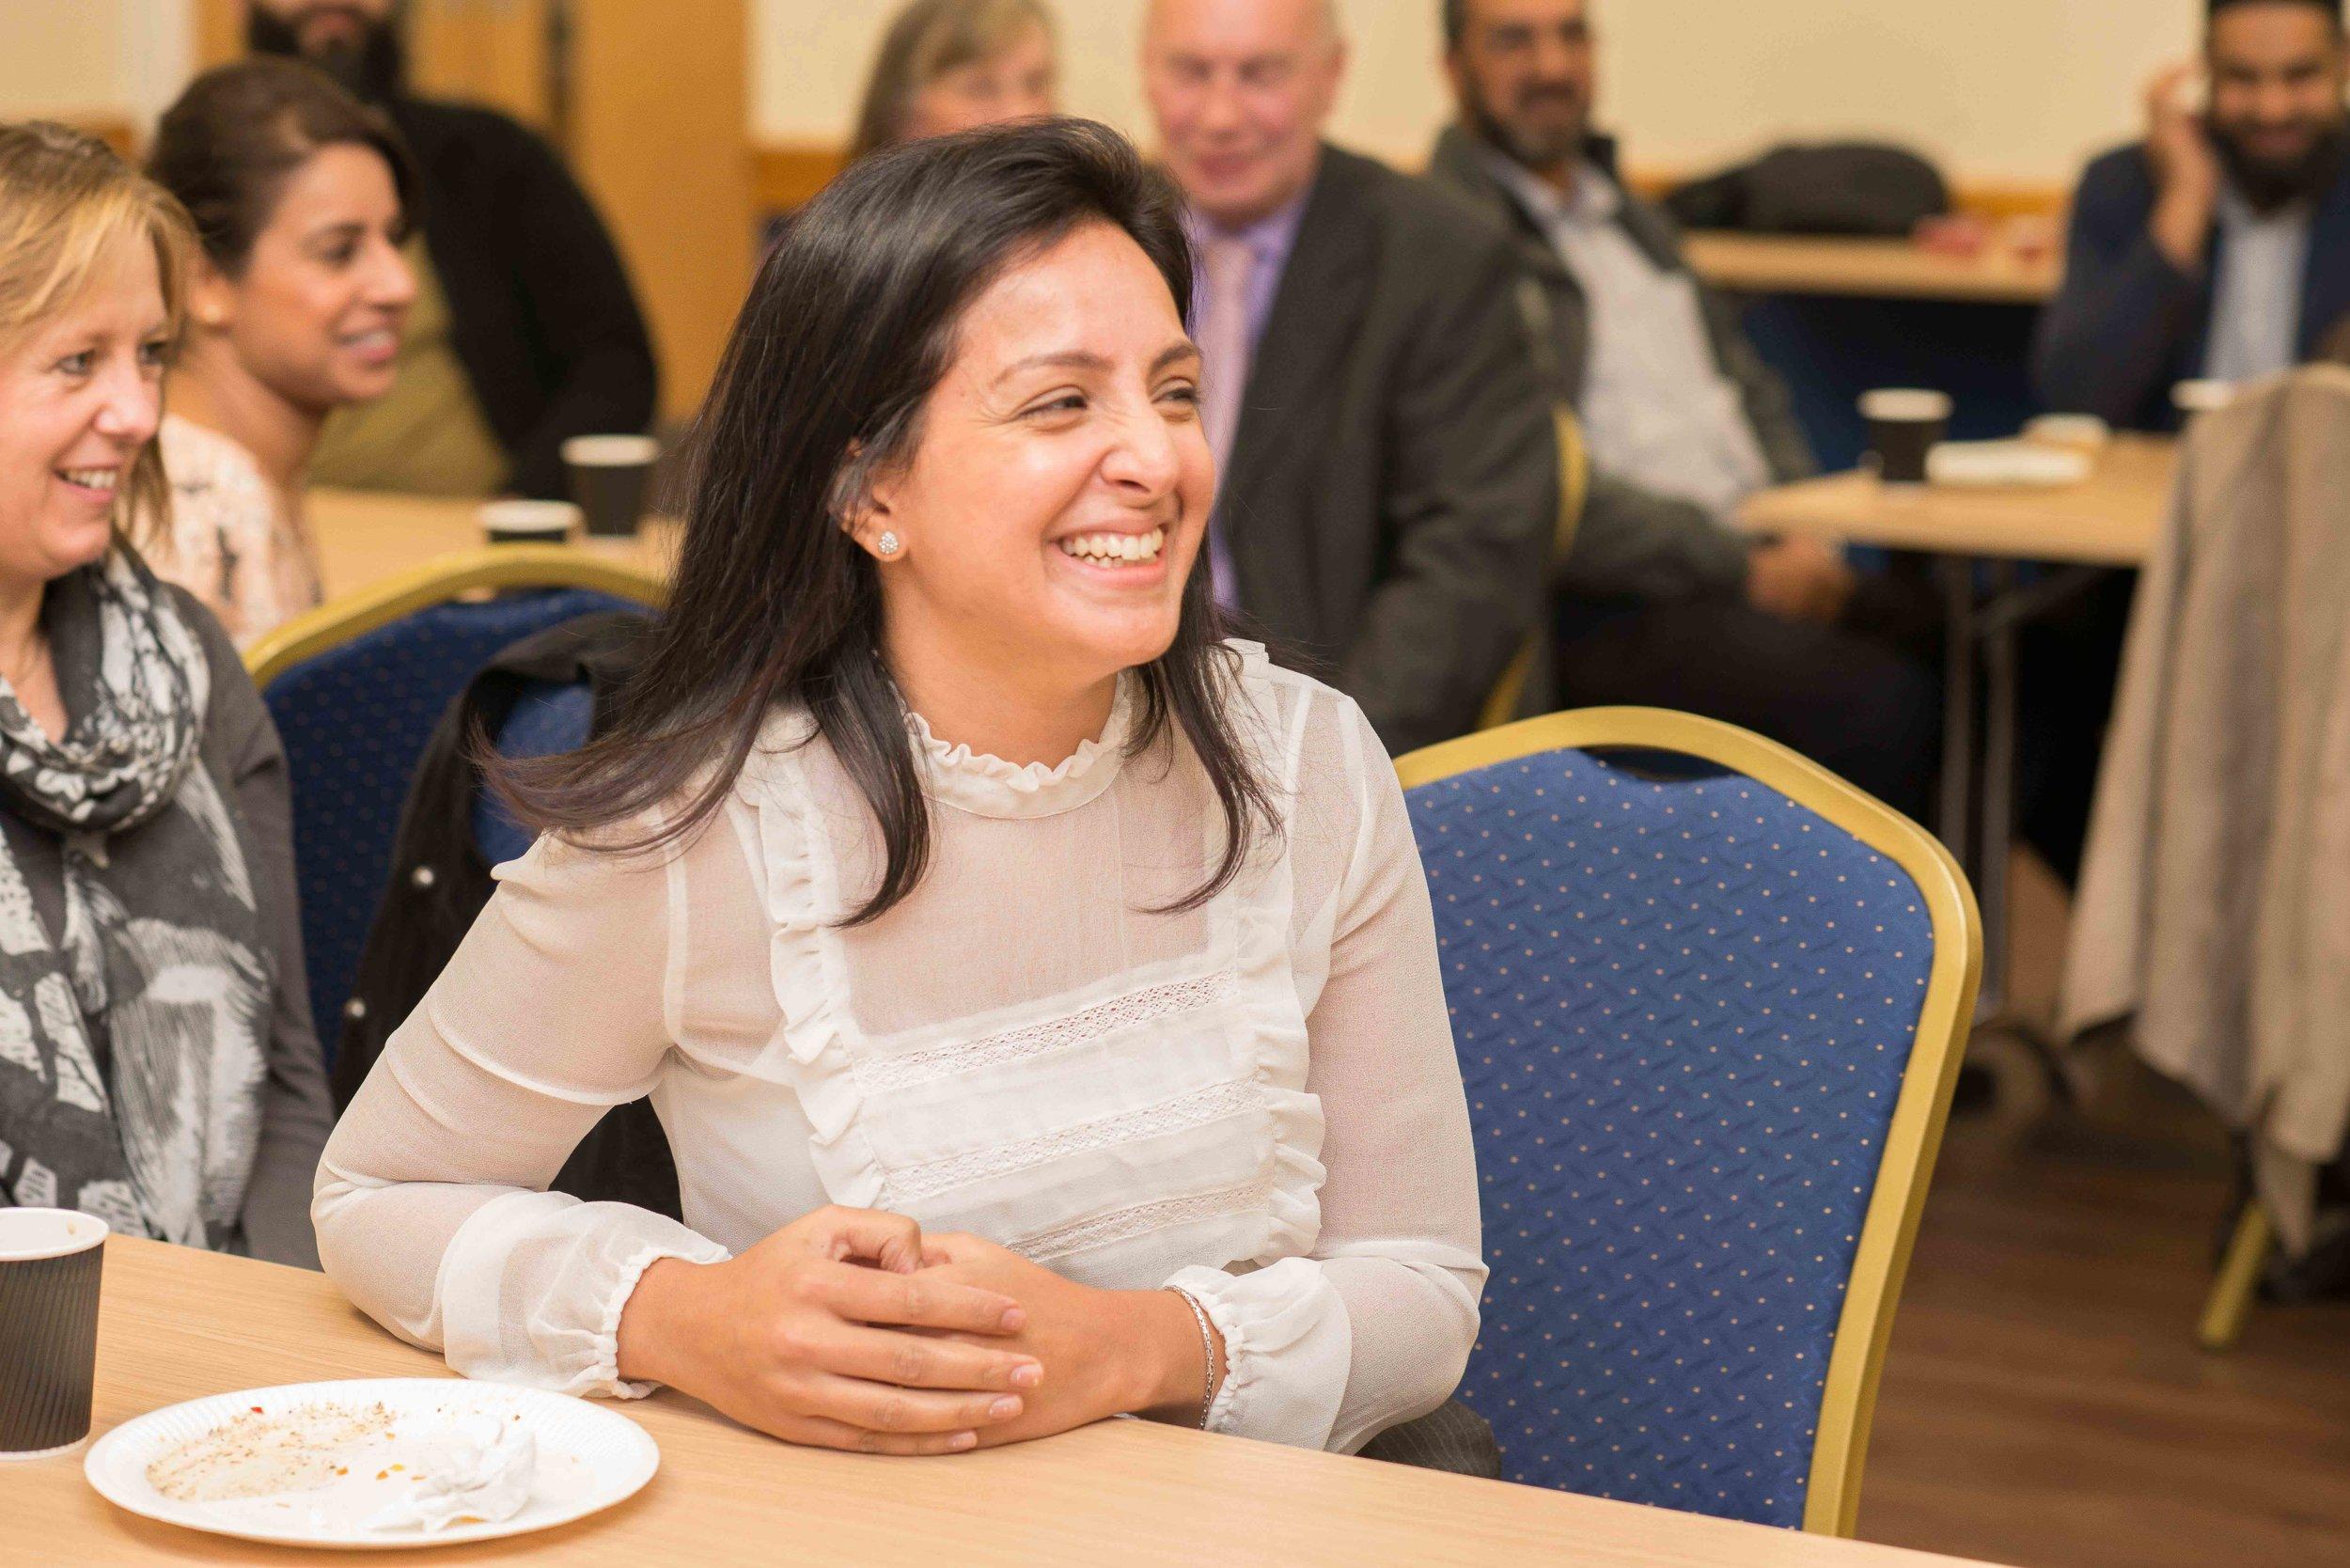 Enterprise Networking Event - 7th November 2017, Park Lane Centre, Bradford